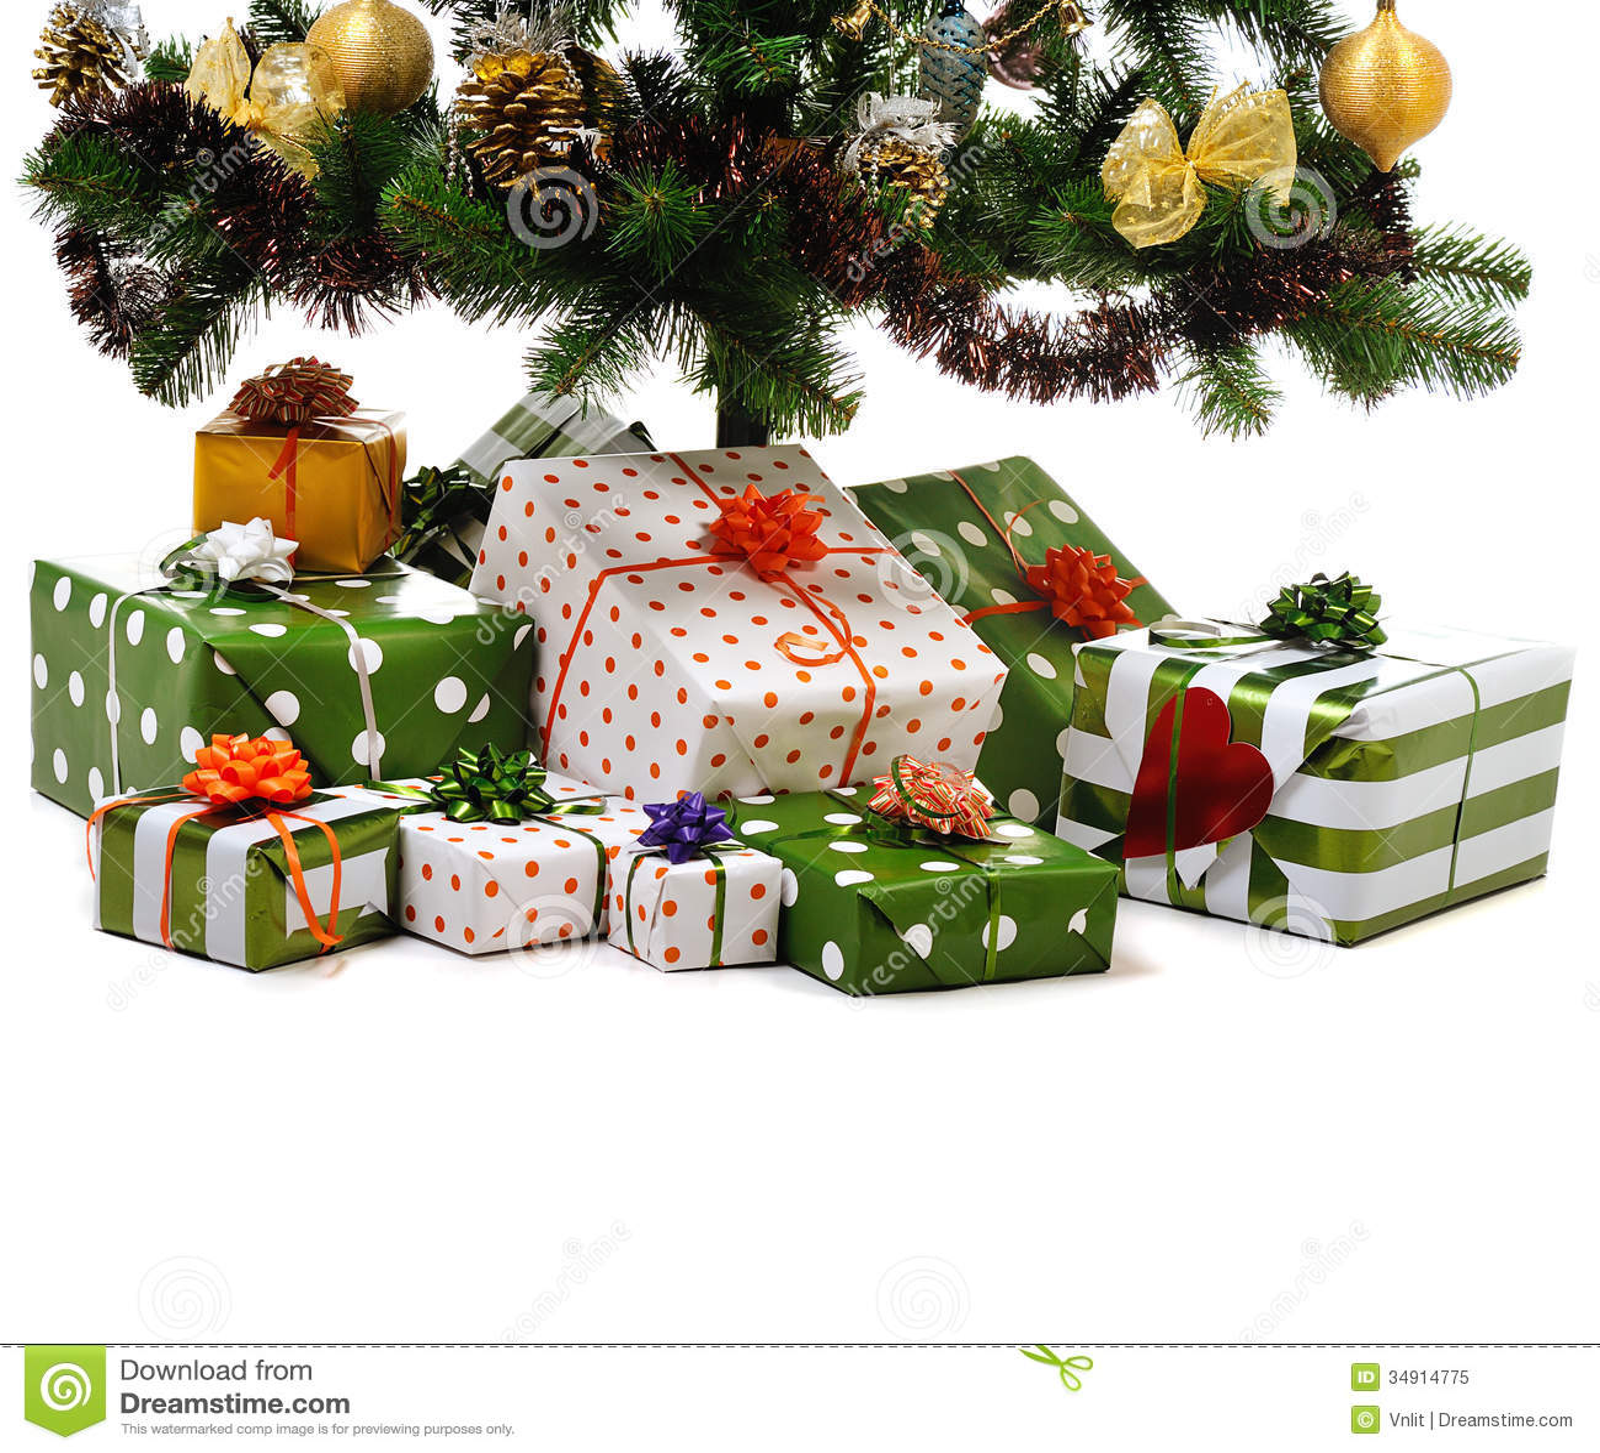 Gift Boxes Under Christmas Tree Royalty Free Stock Photo - Image ...